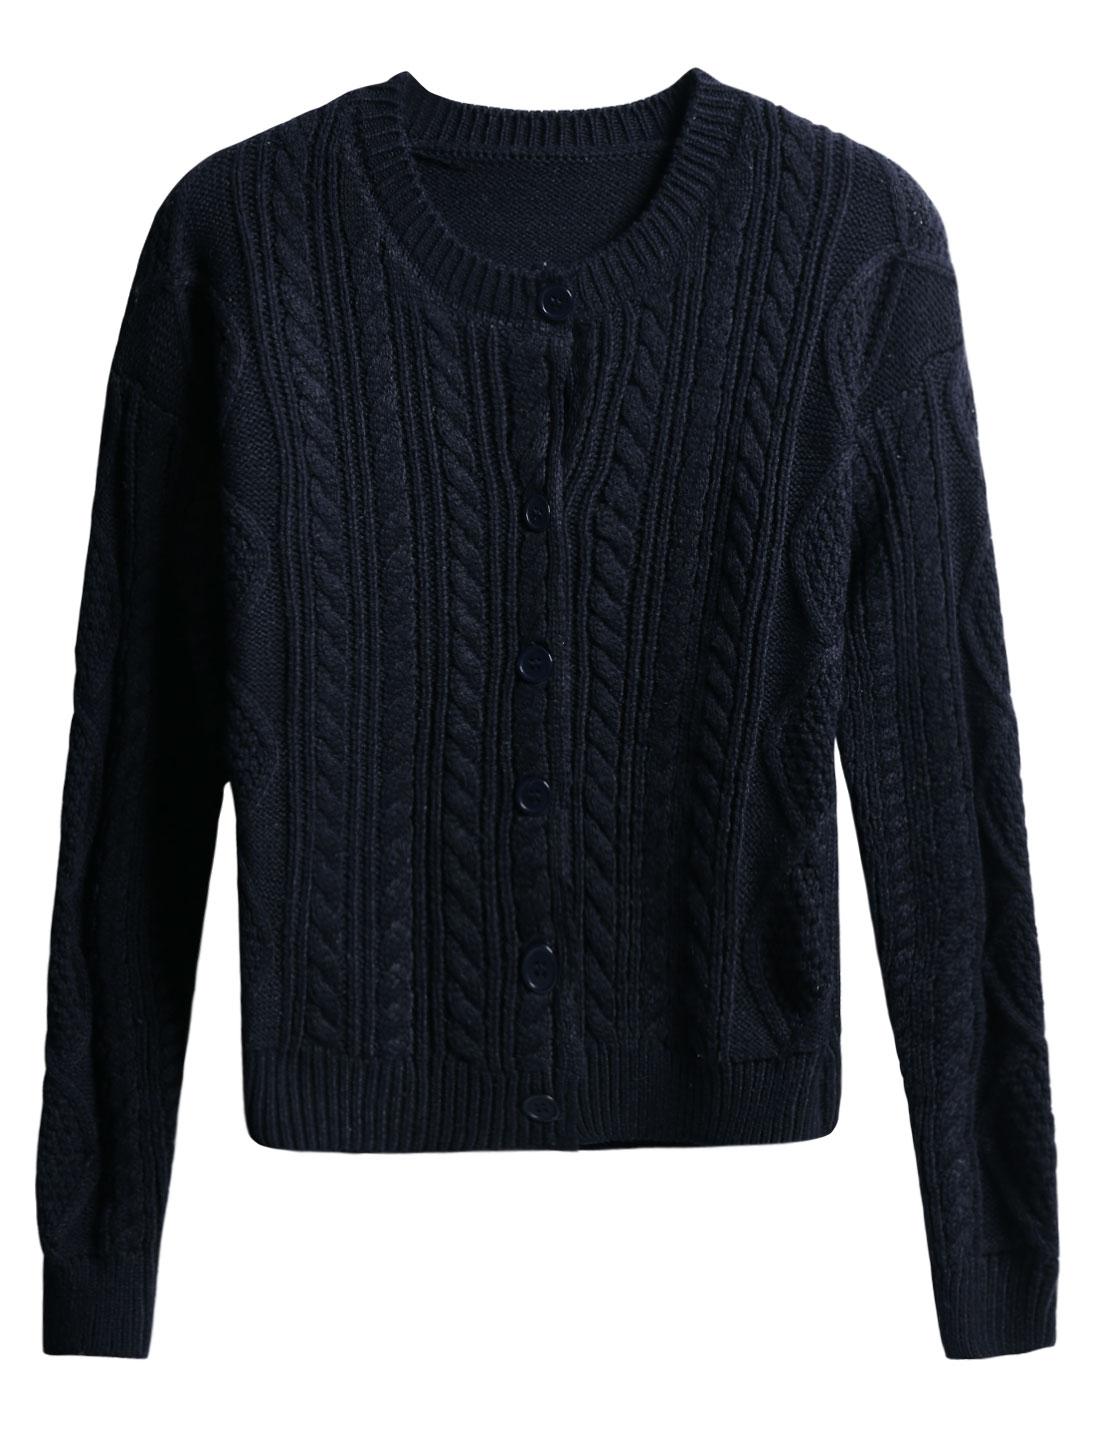 Woman Braided Design Round Neck Button Closure Sweater Cardigan Navy Blue M